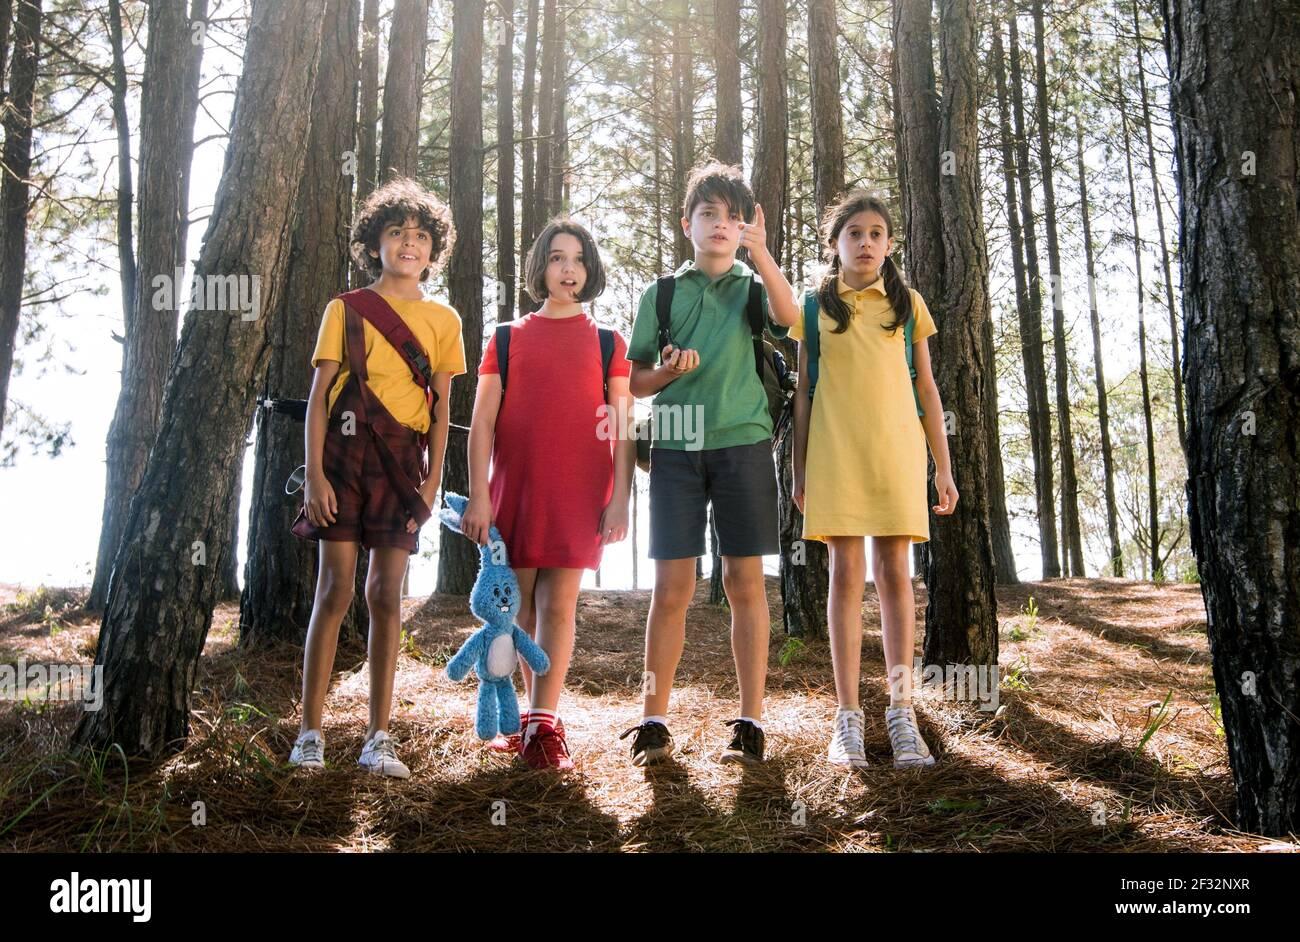 MOREIRA,BENITTE,VECHIATTO,RAUSEO, MONICA ET SES AMIS: BONDS, 2019, ©PARAMOUNT PICTURES Banque D'Images